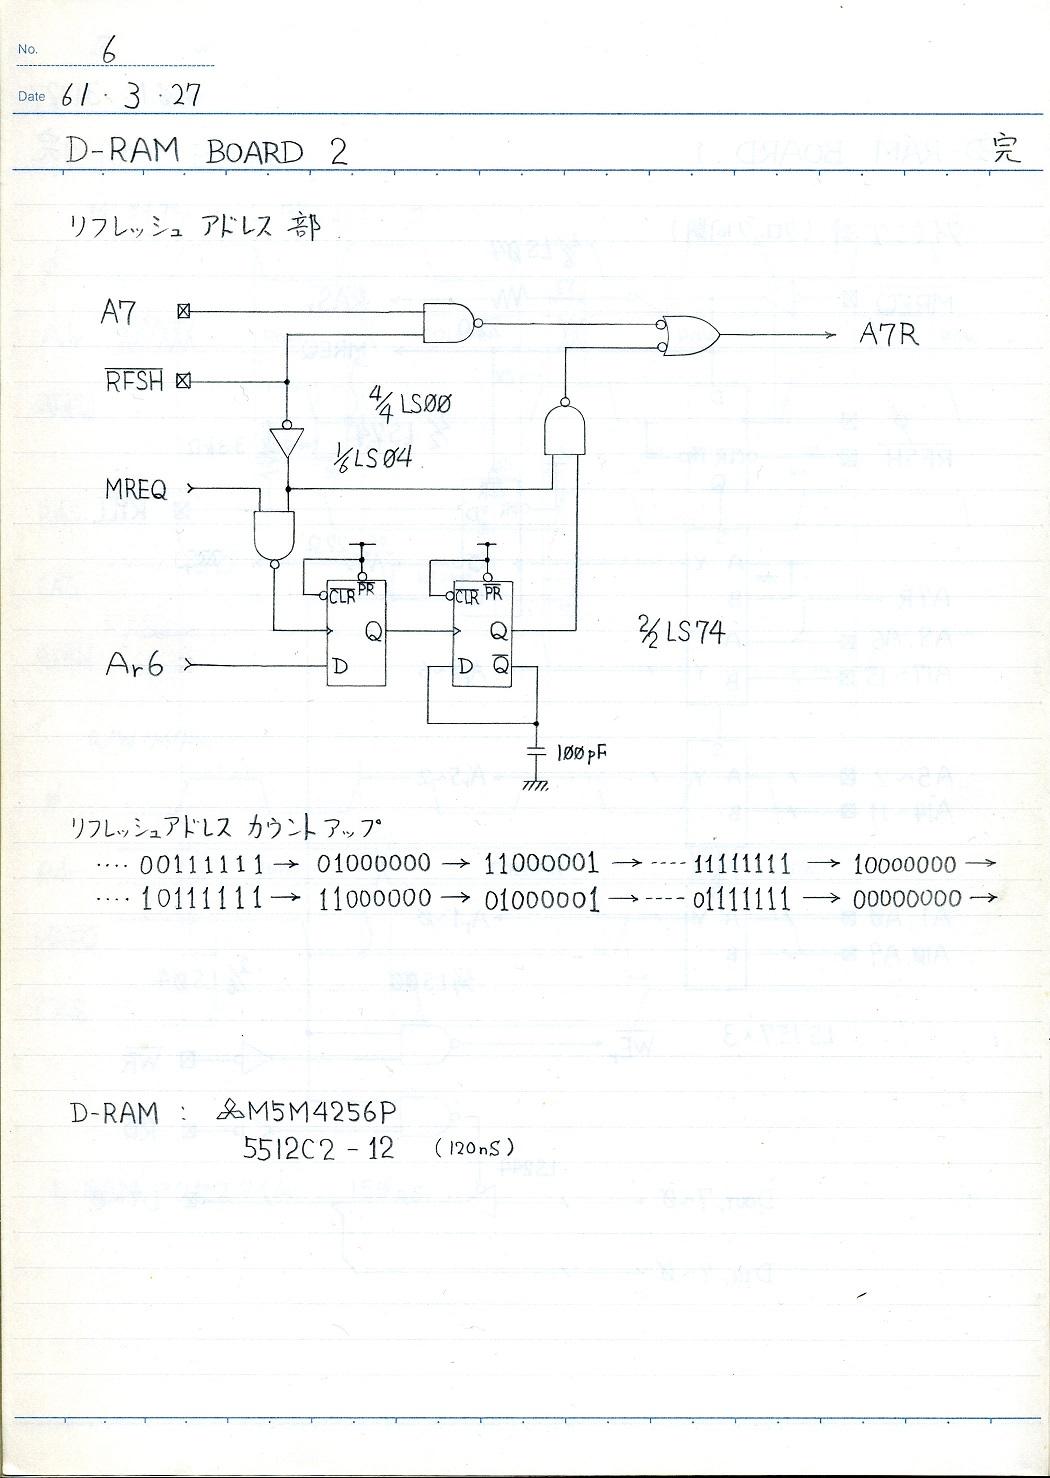 D-RAM board circuit 2